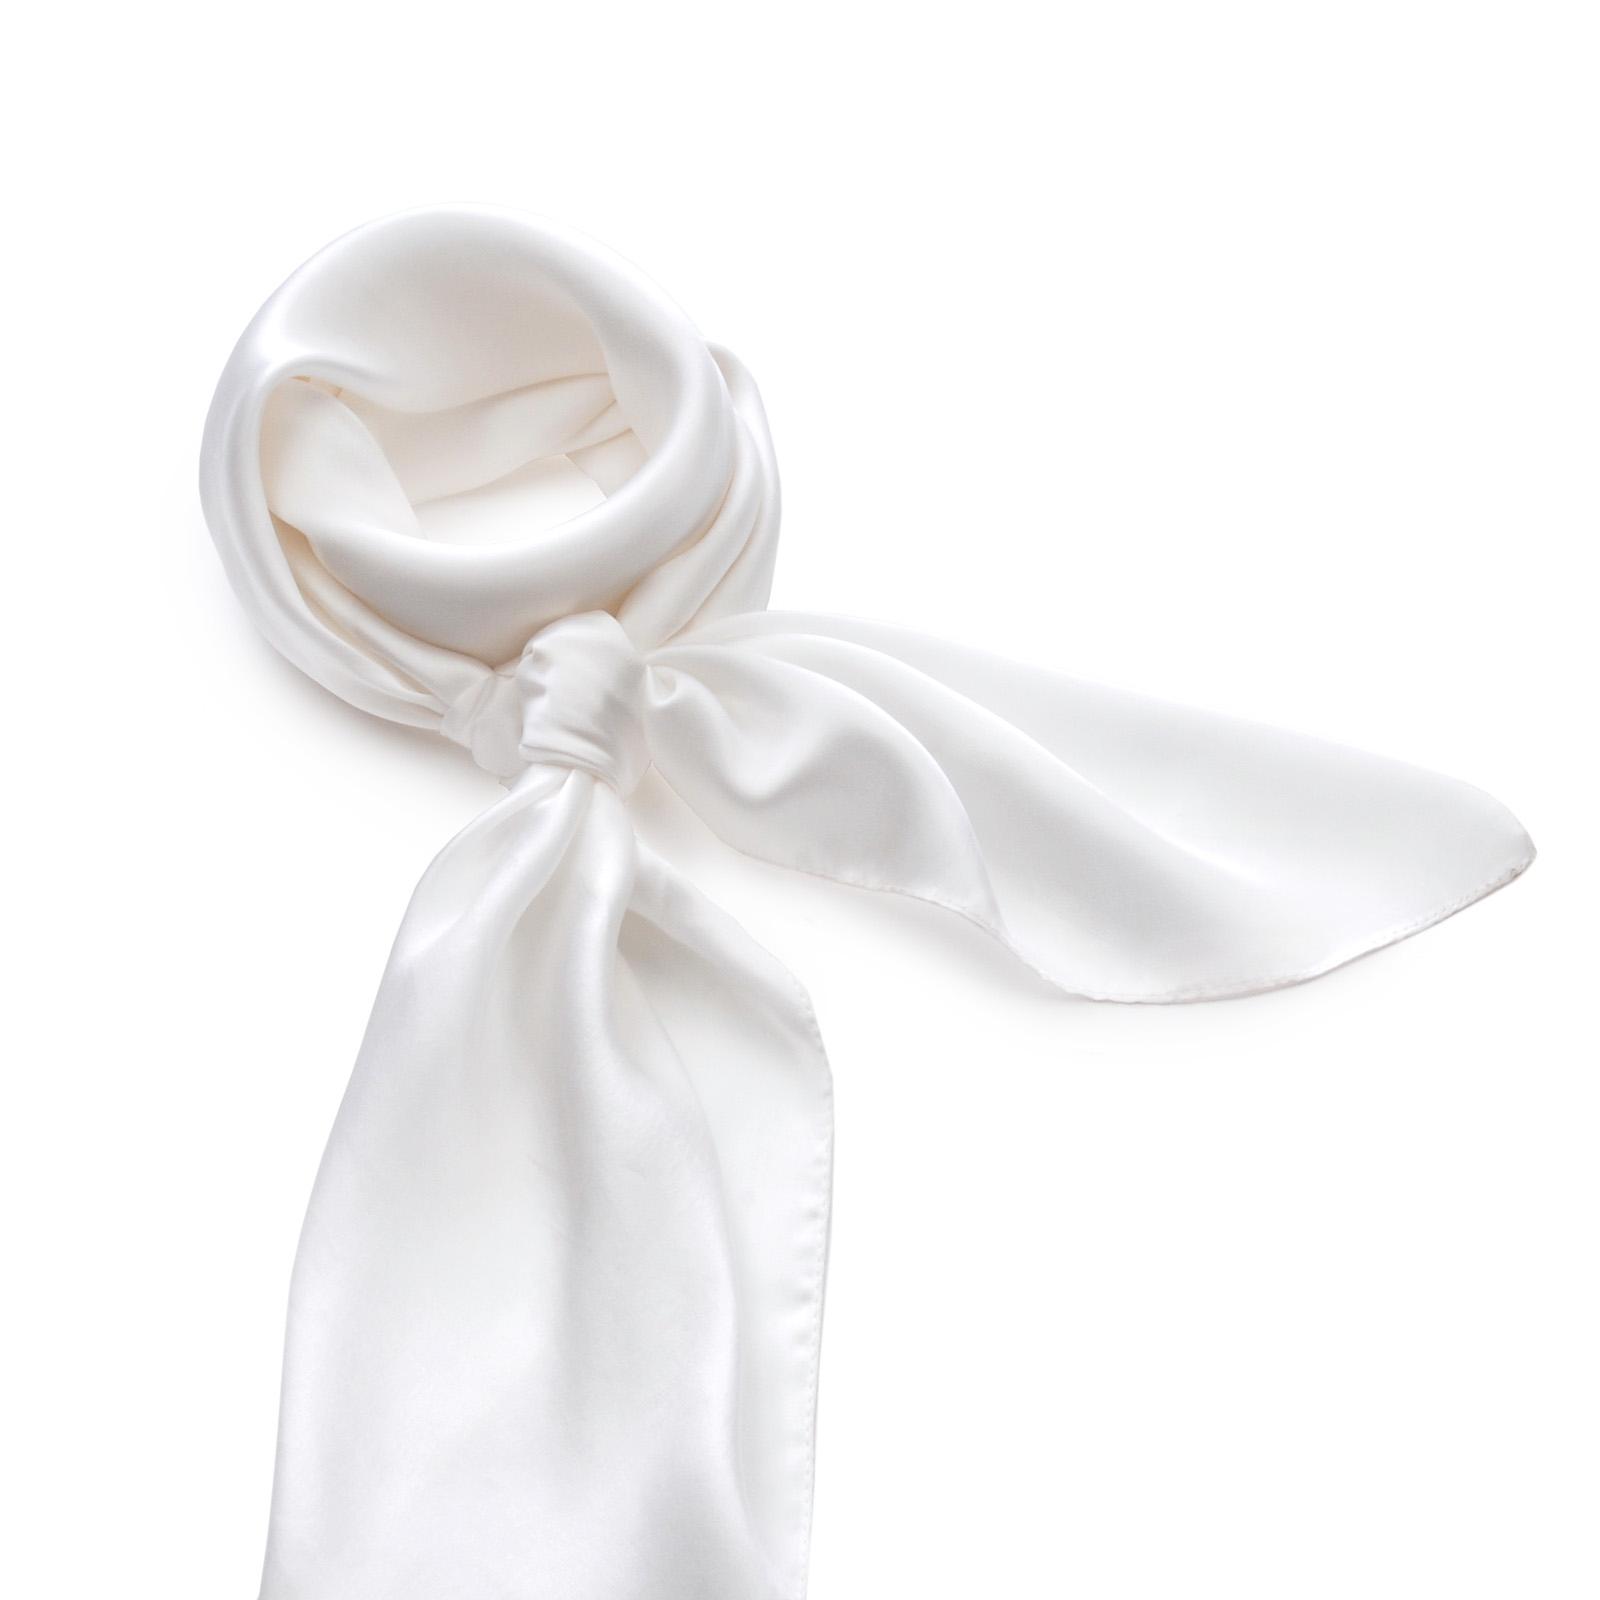 carre-soie-epaisse-blanc-AT-01979--A16